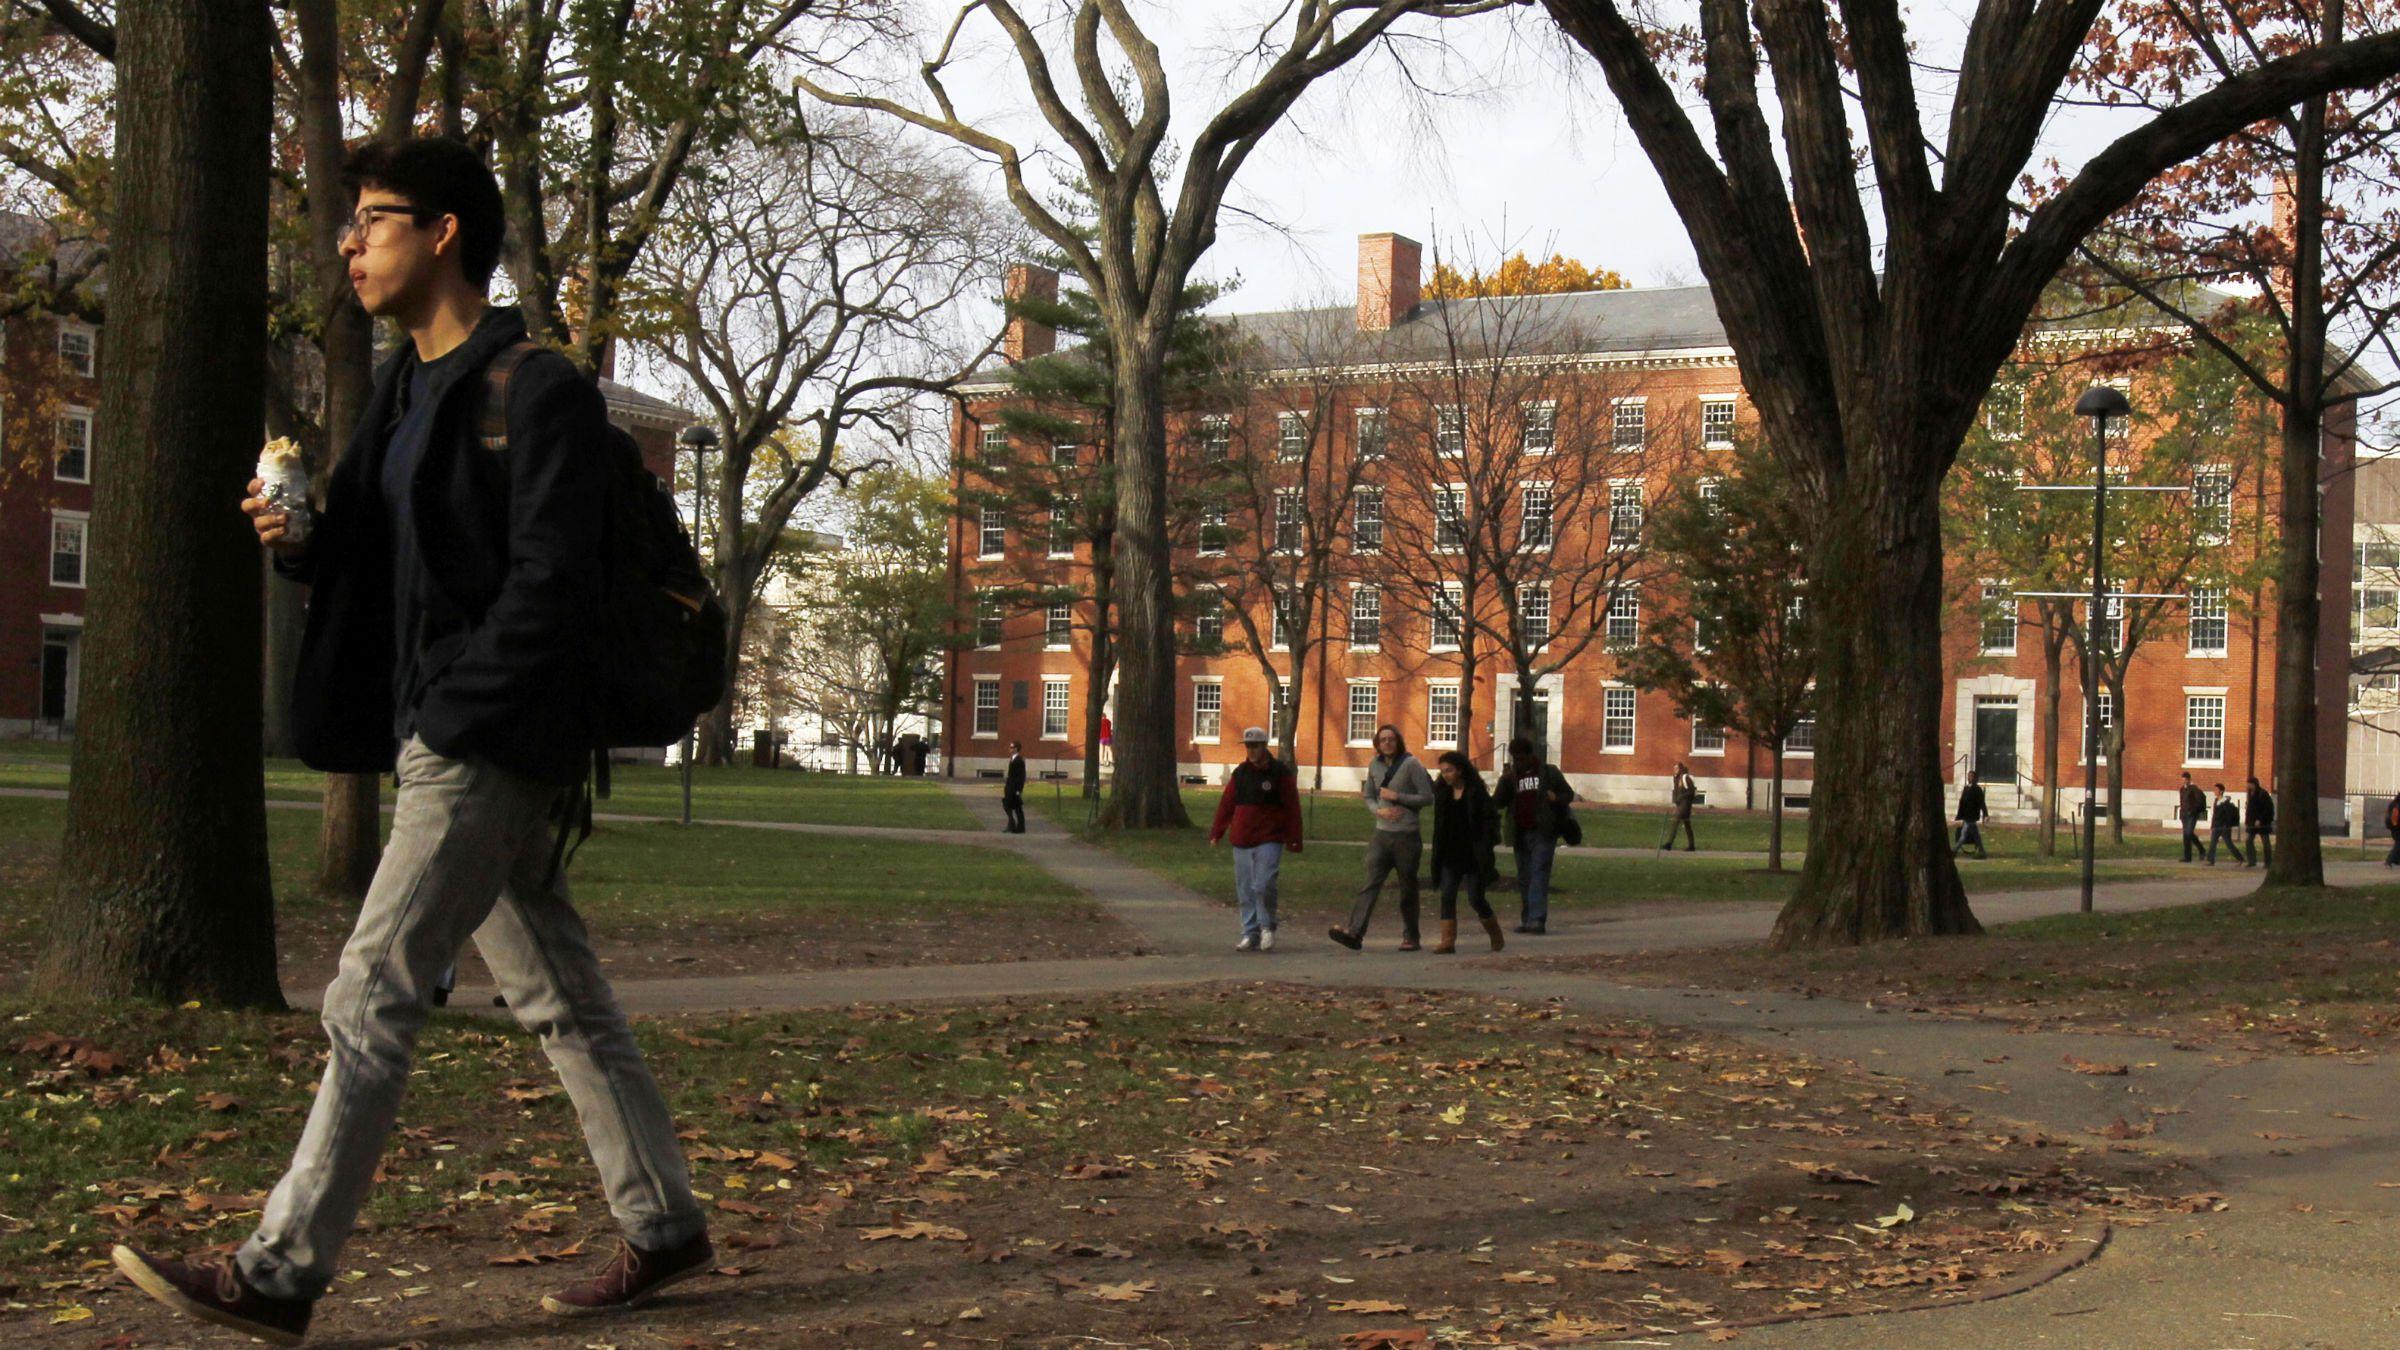 A man walks through Harvard Yard at Harvard University in Cambridge, Massachusetts.